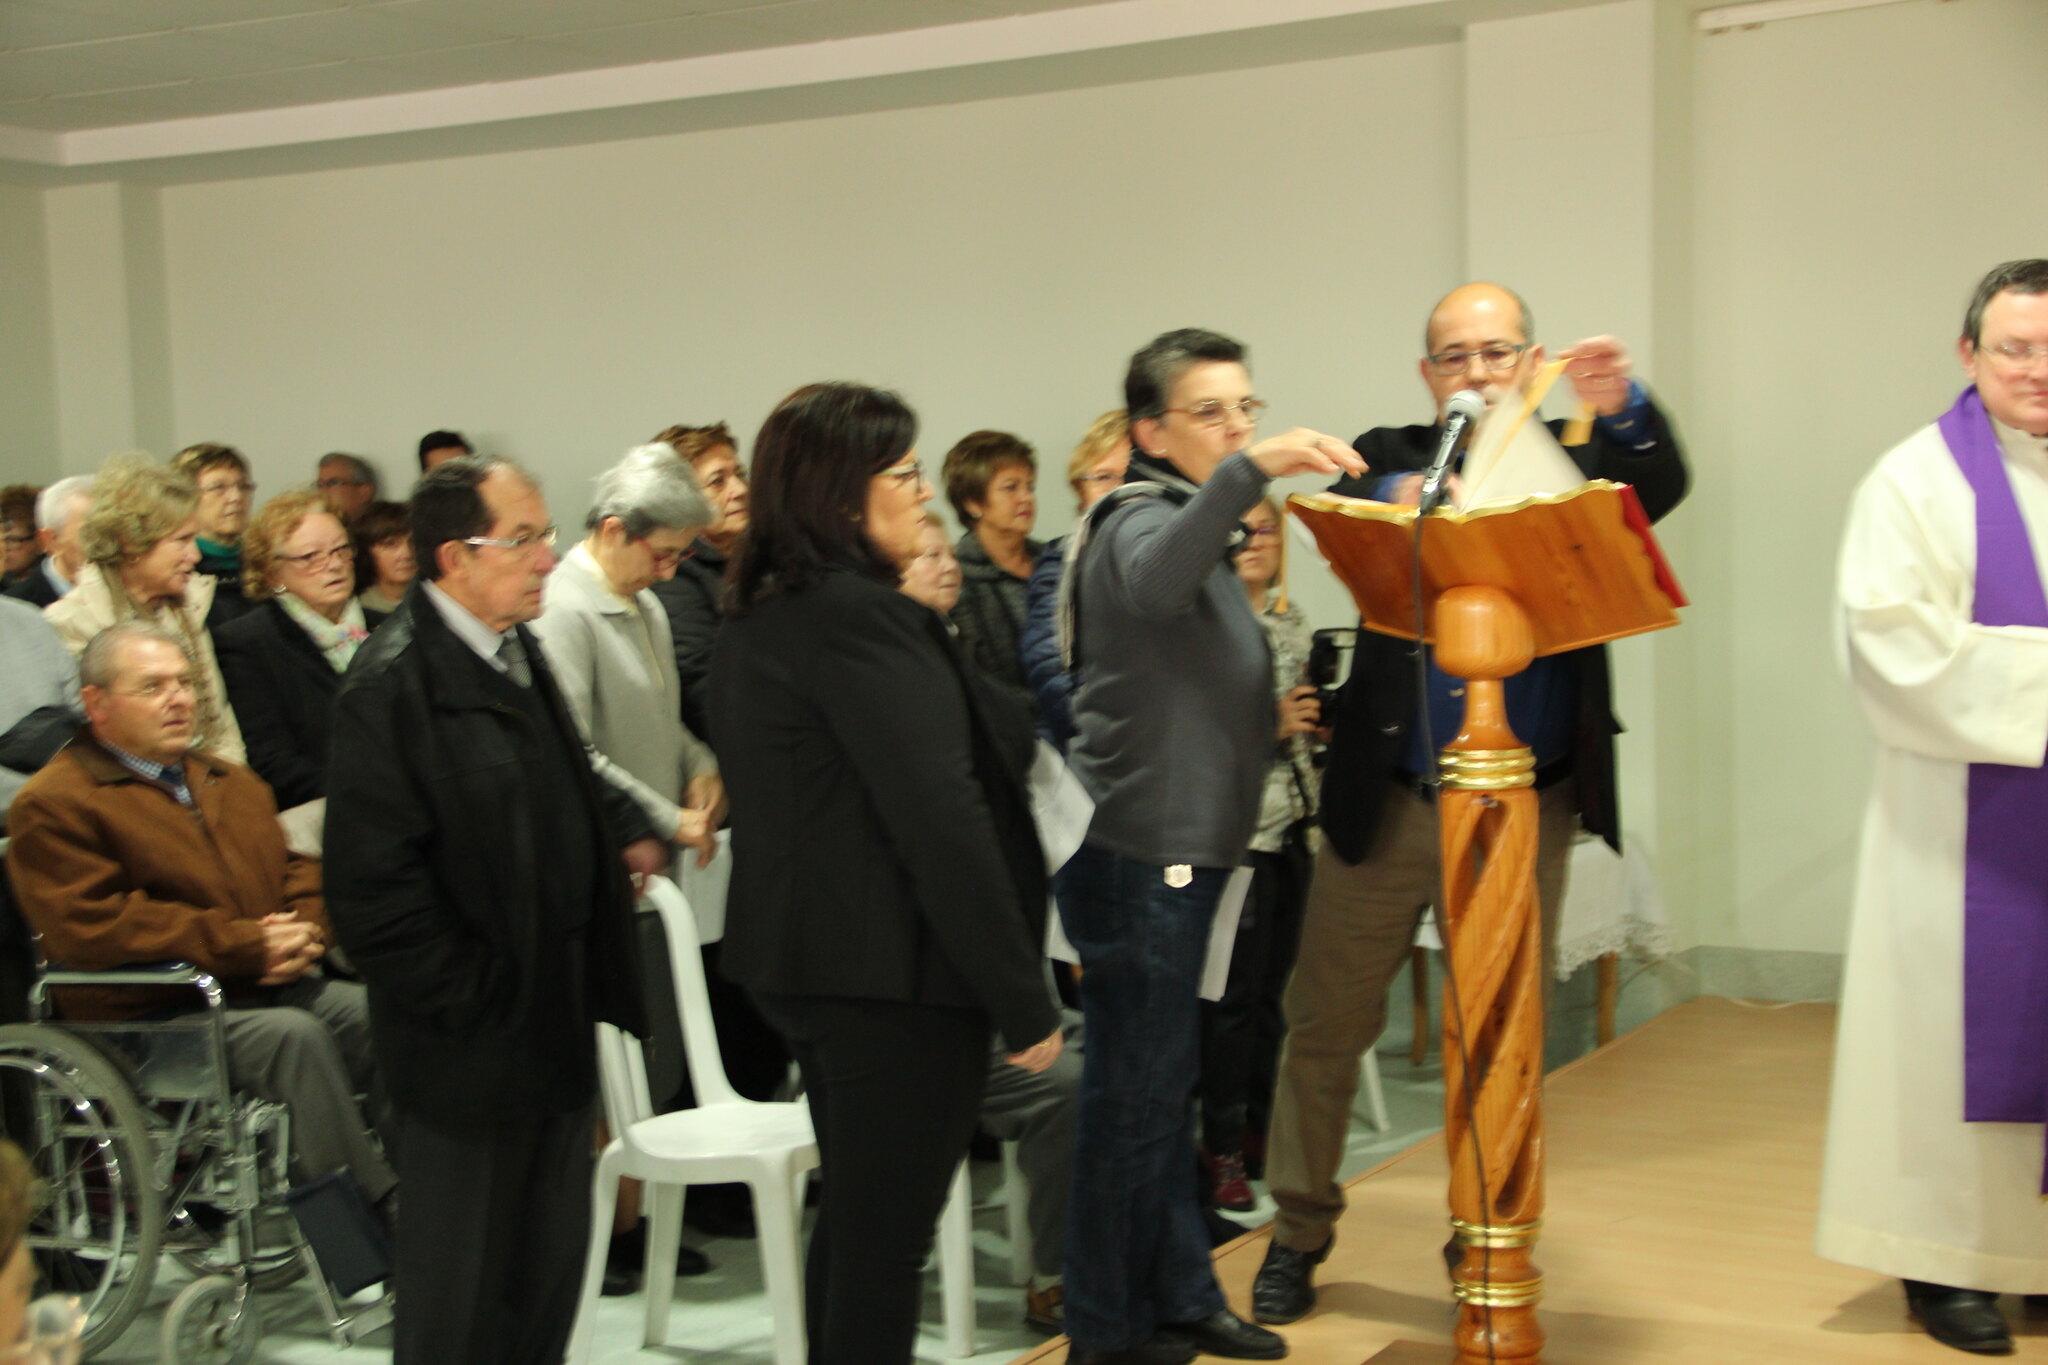 (2016-02-13) - Inauguración Virgen De Lourdes, La Molineta - Archivo La Molineta (003)